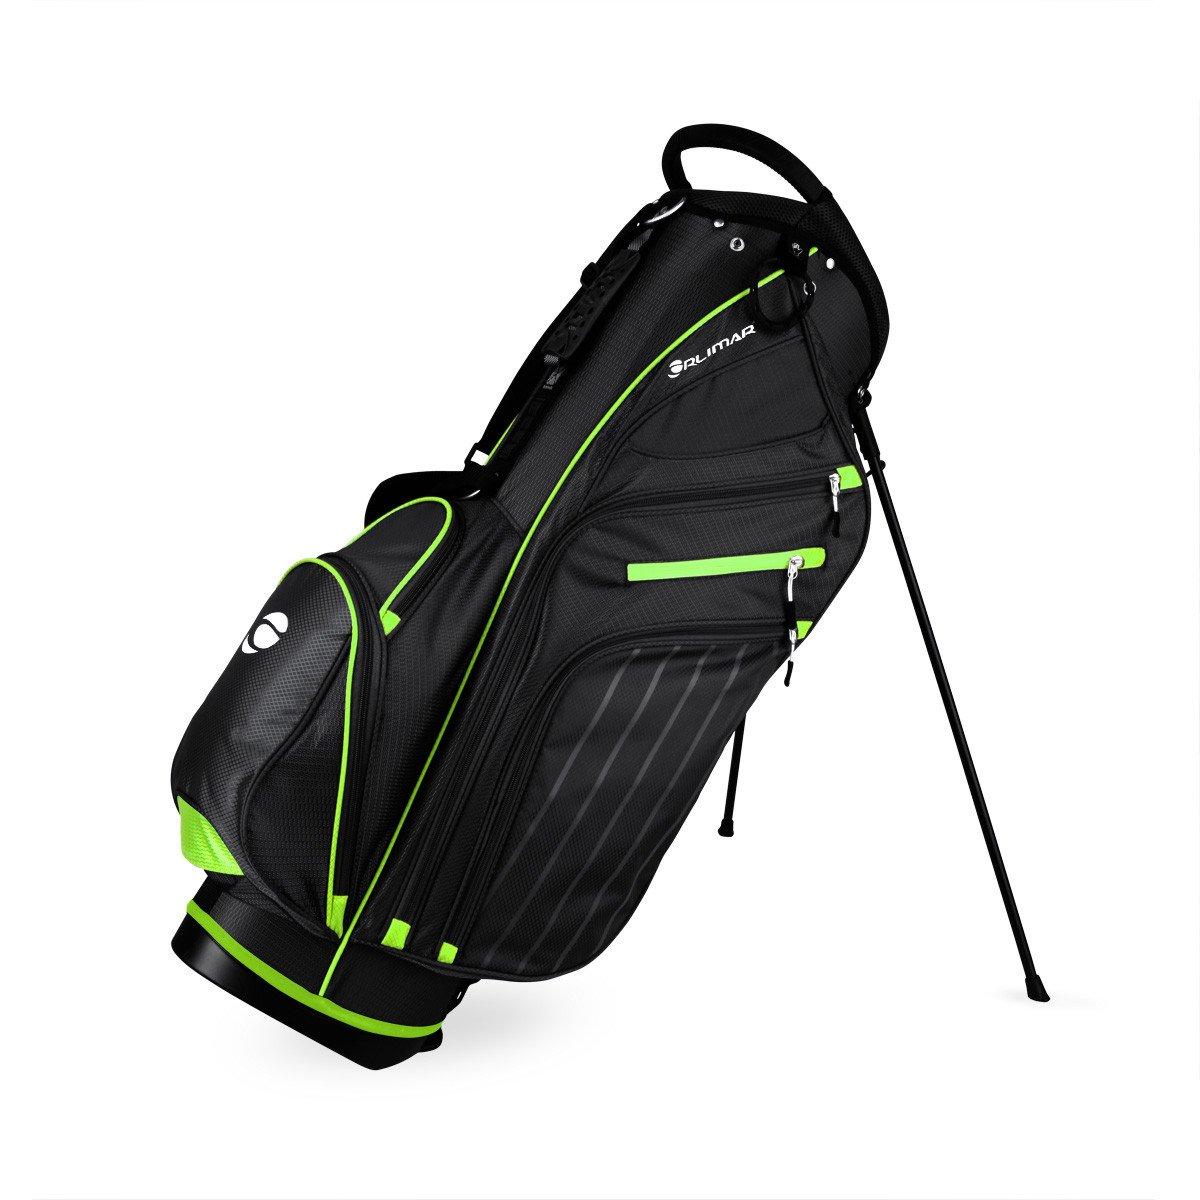 Orlimar SRX 14.9 Golf Stand Bag